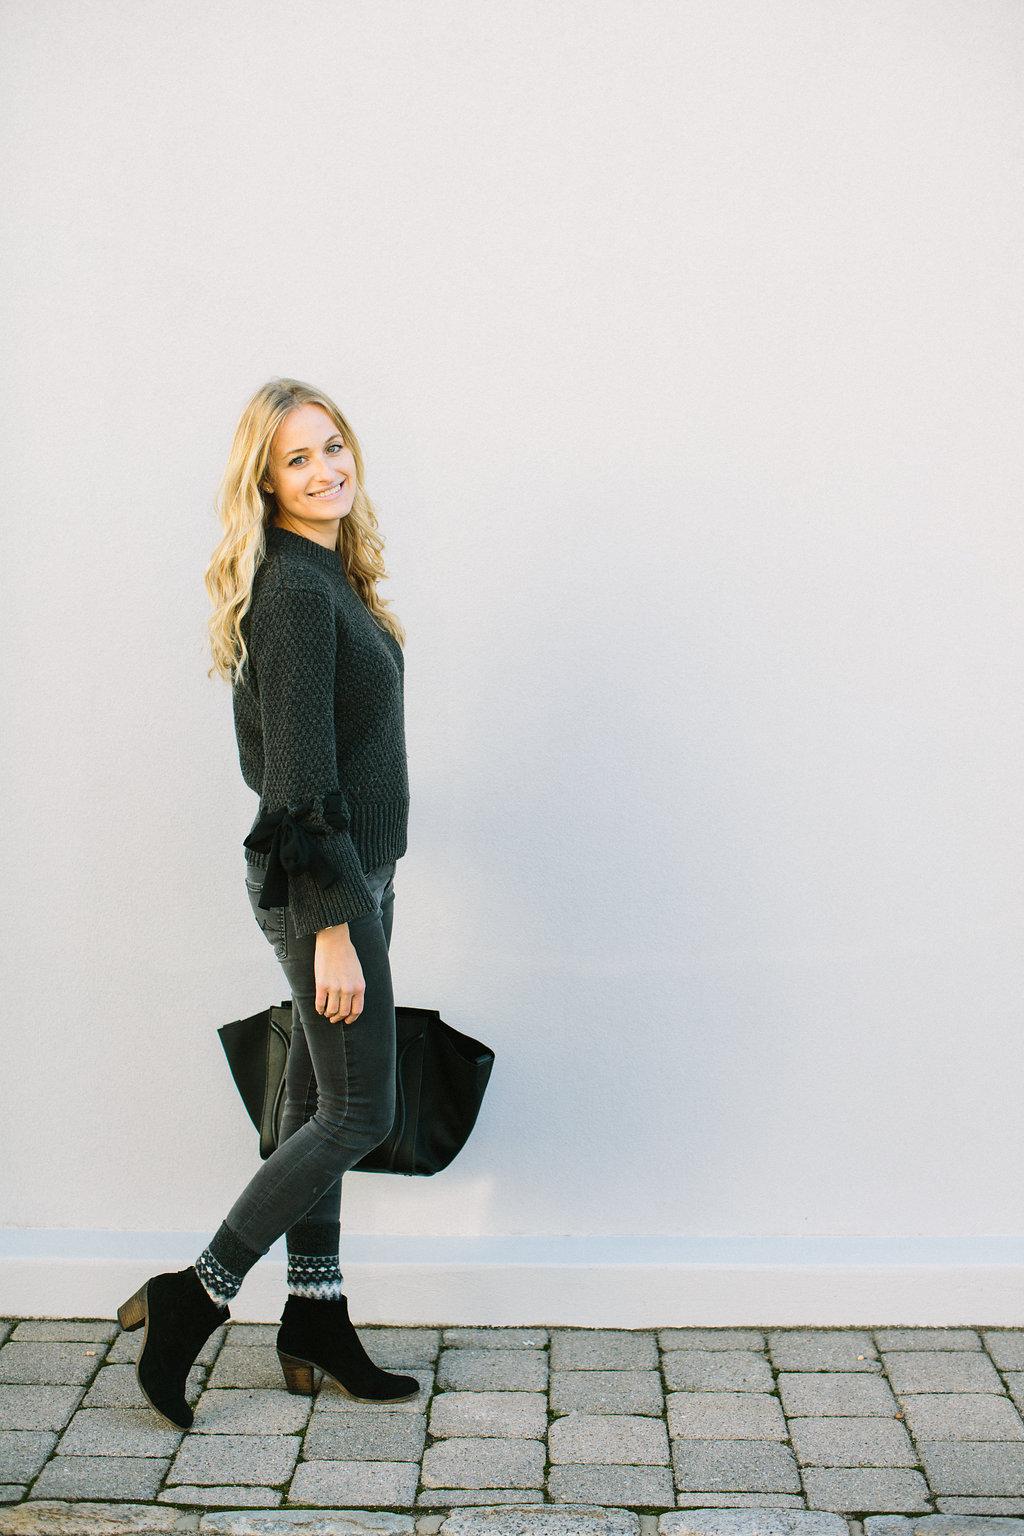 StephanieTrotta-clubmonaco-TheGirlGuide-LindsayMaddenPhotography-7.jpg